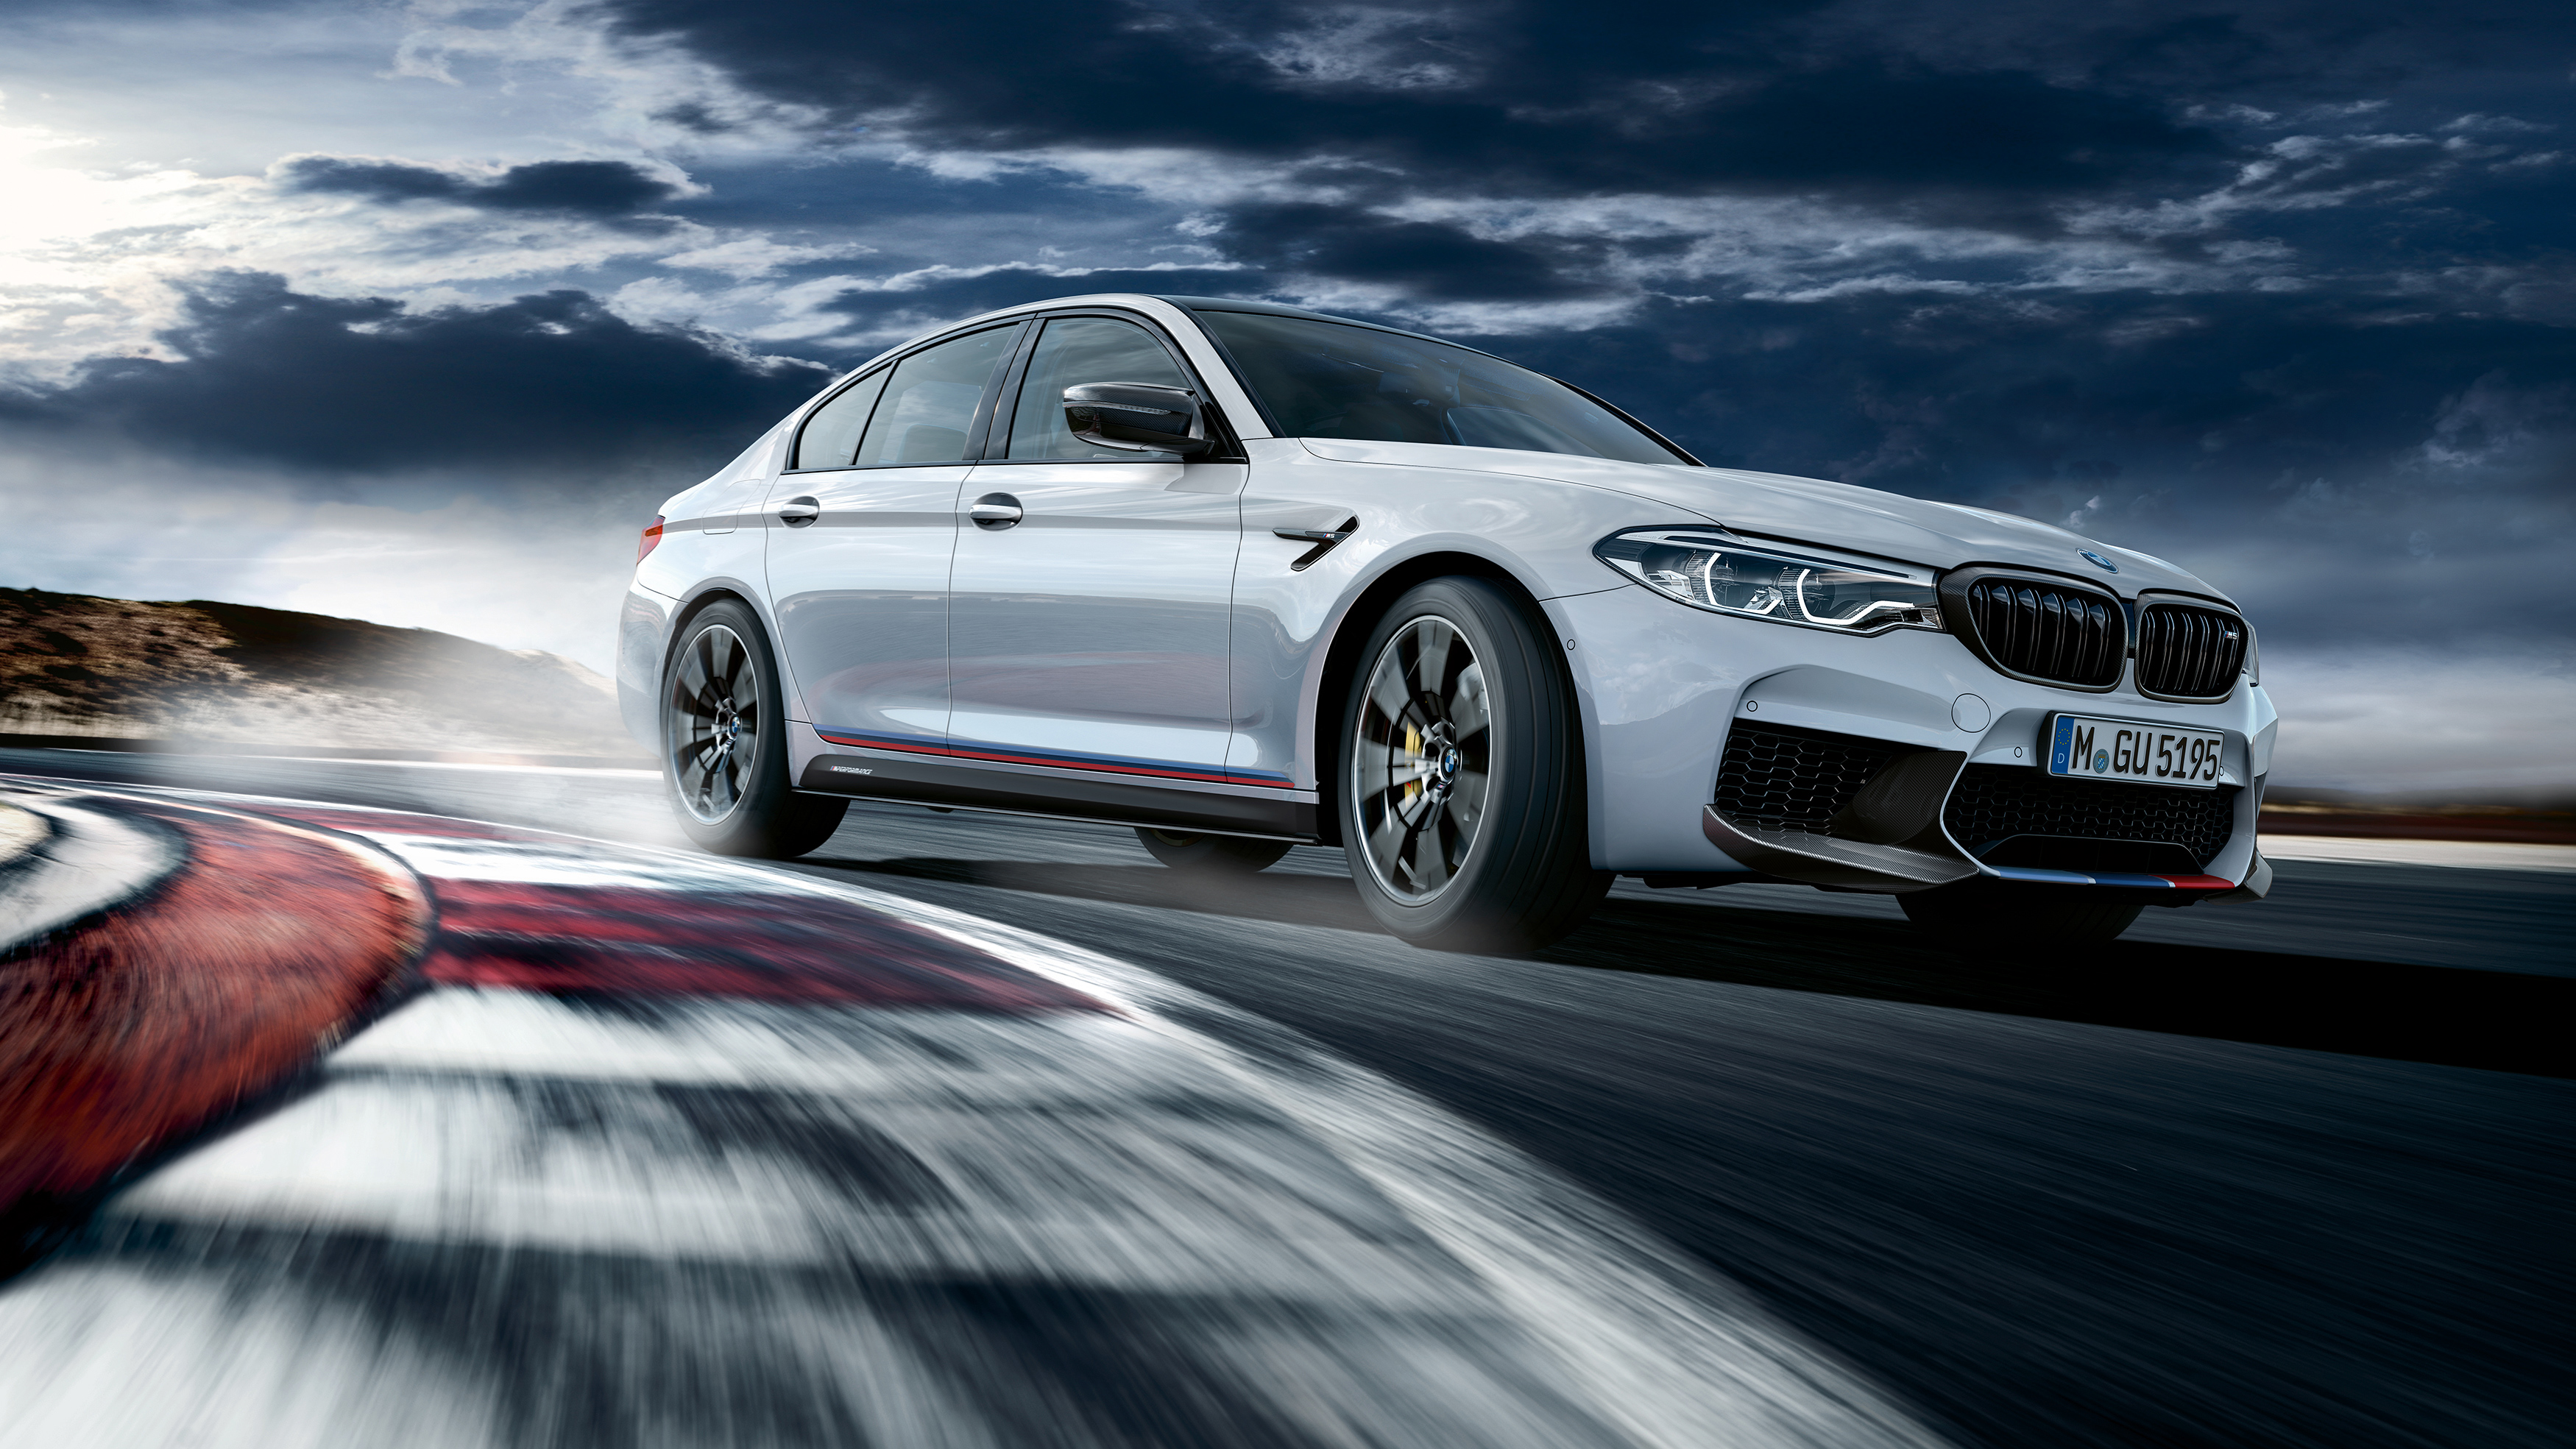 2018 BMW M5 M Performance Parts Wallpaper HD Car Wallpapers ID 3500x1969